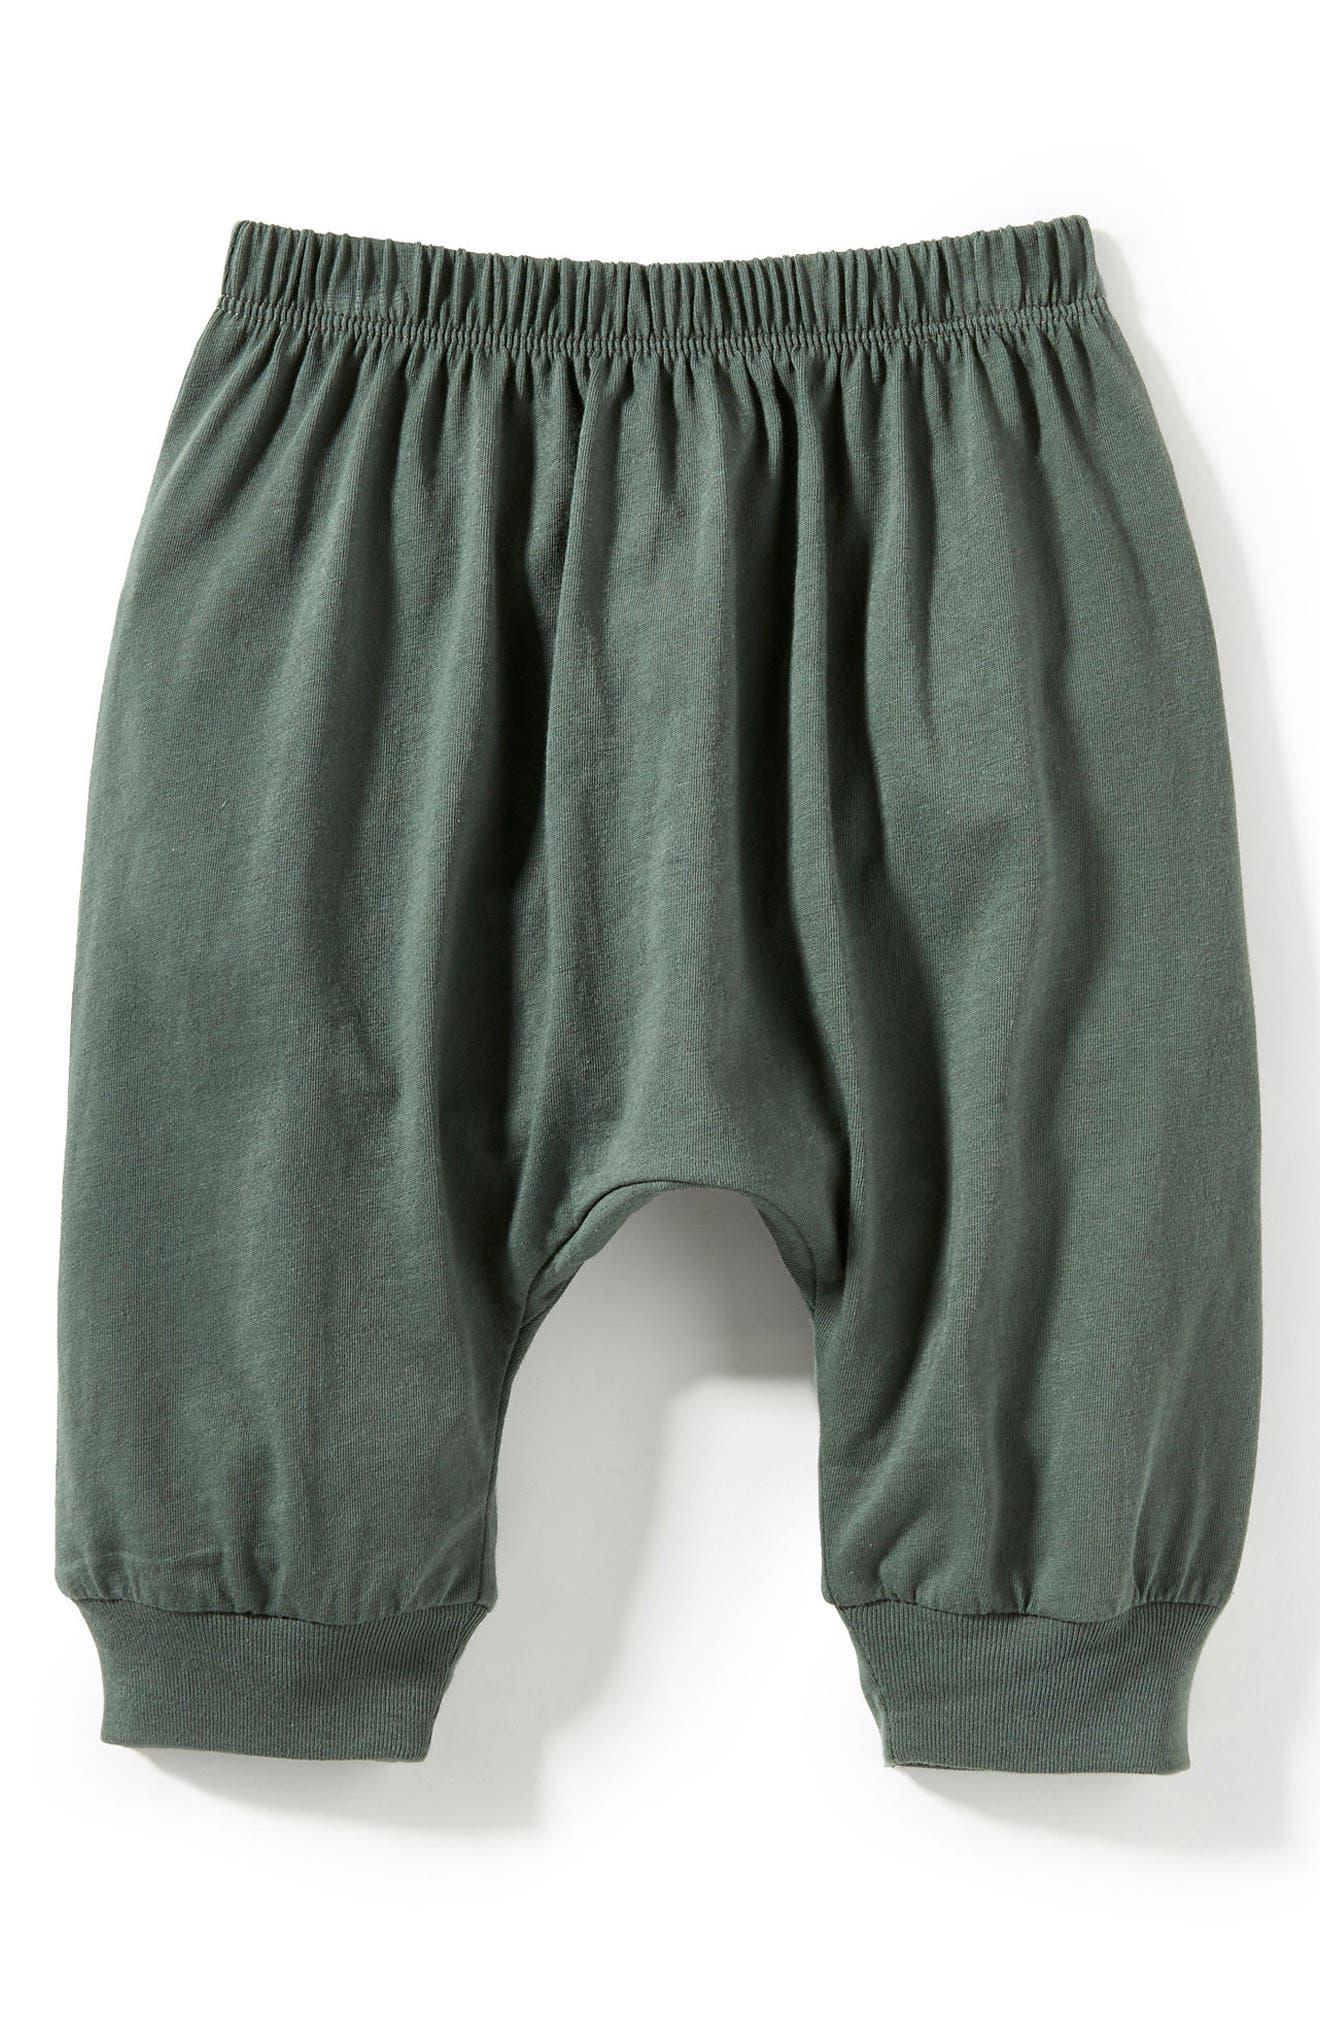 Alternate Image 1 Selected - Peek Little Peanut Jogger Pants (Baby Boys)